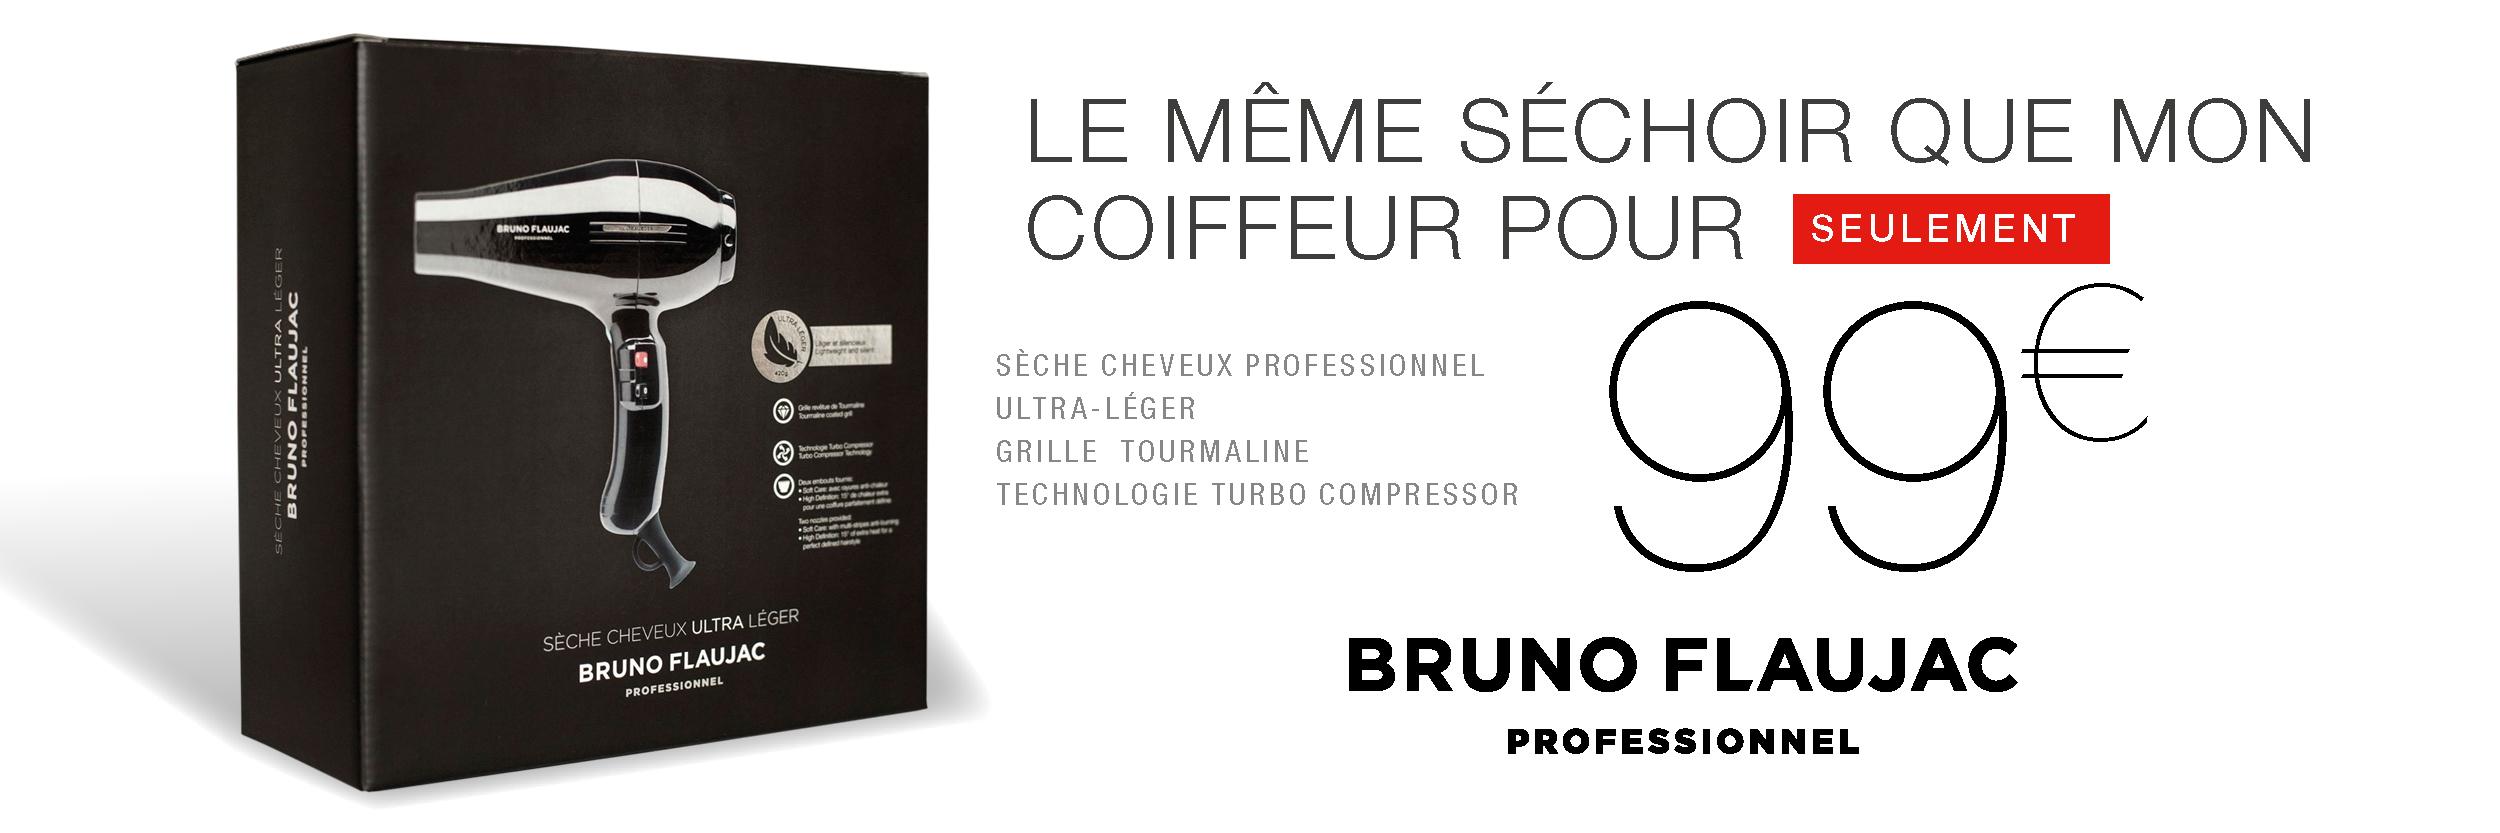 Sèche cheveux professionnel Bruno Flaujac